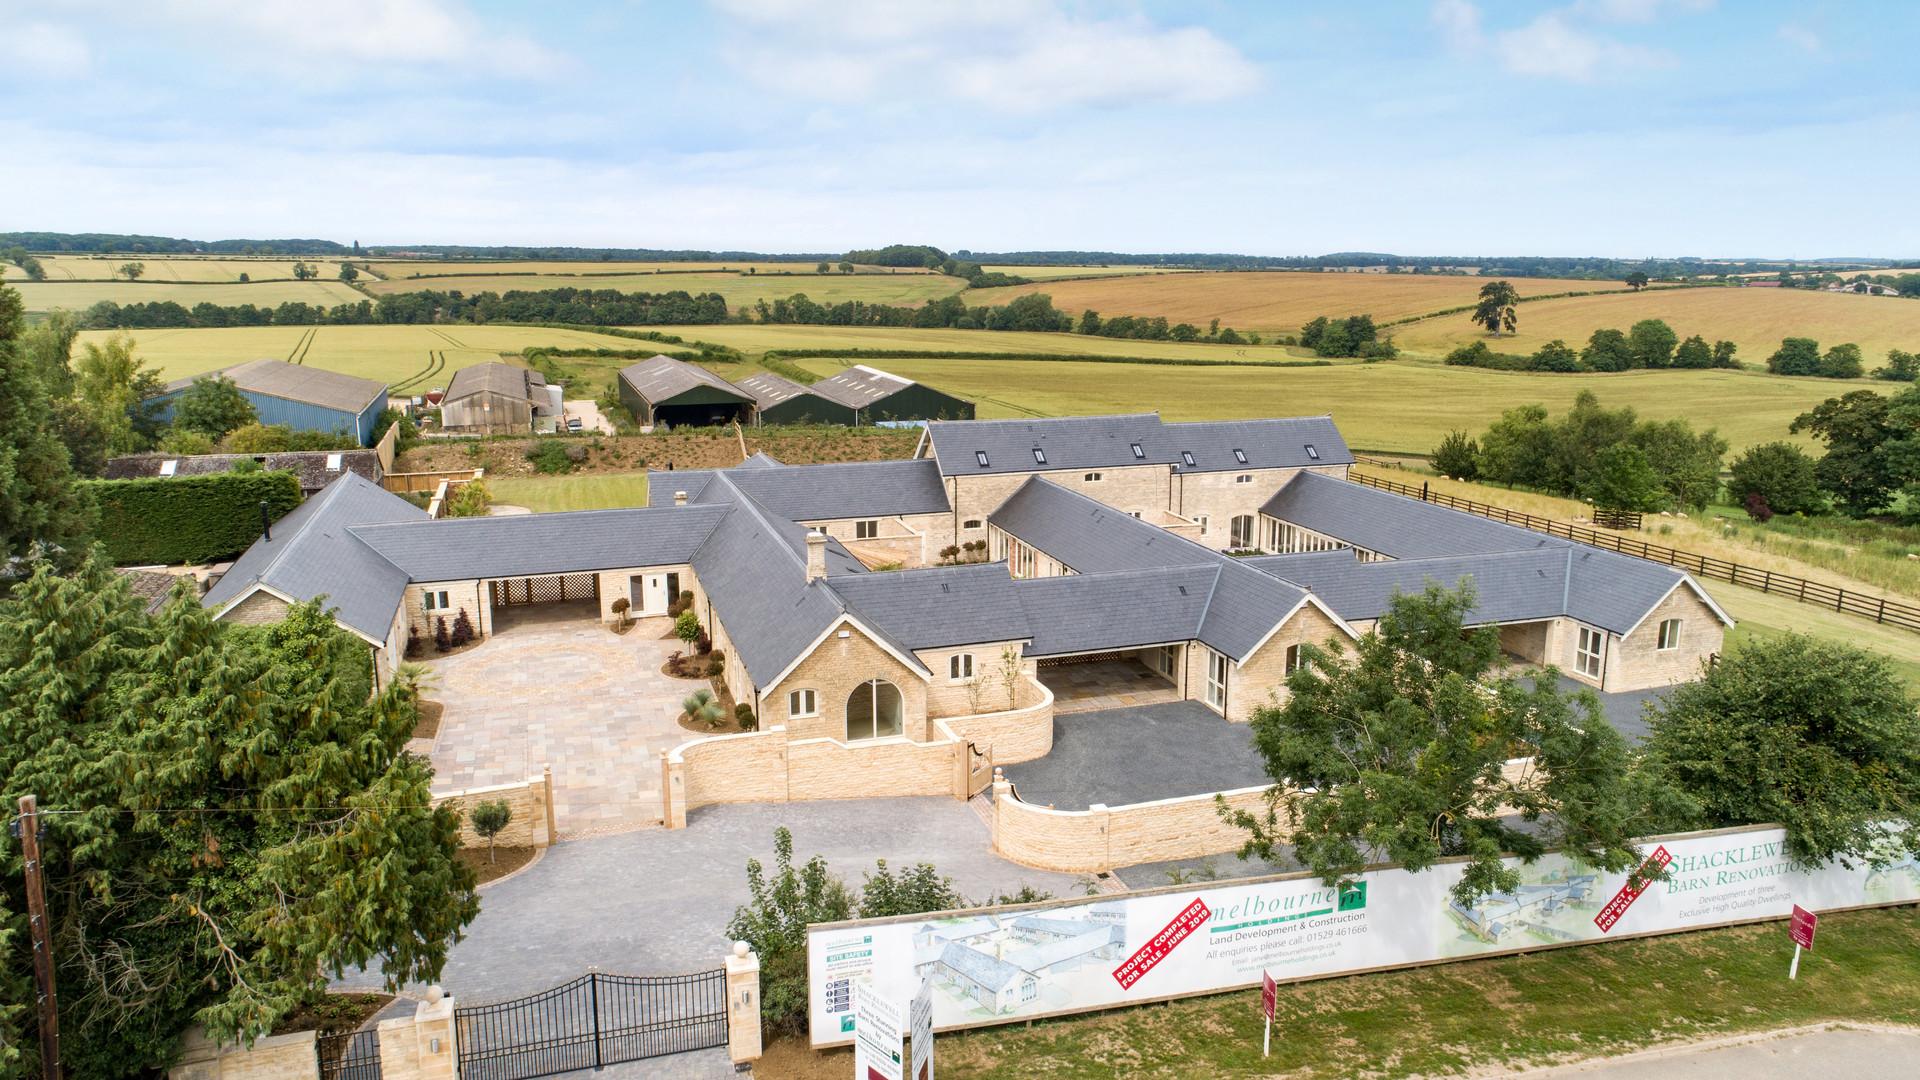 Shacklewell Lodge Barns - Aerial - 6.jpg